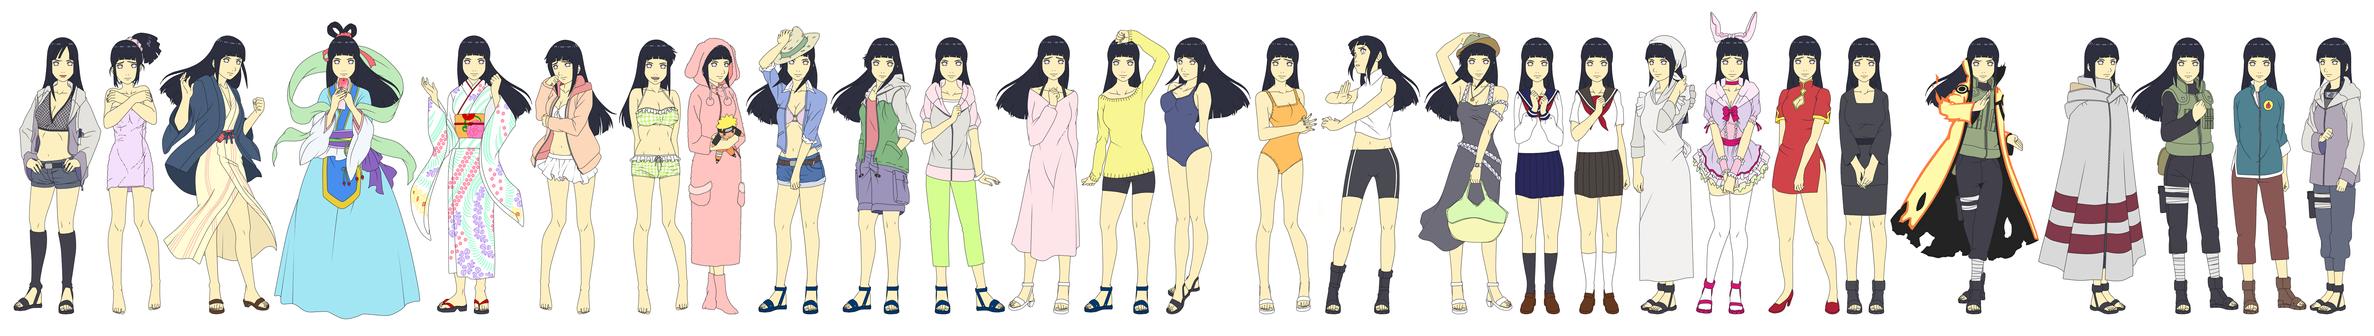 Hinata Hyuuga Outfit Color NARUTO SHIPPUUDEN by SunakiSabakuno